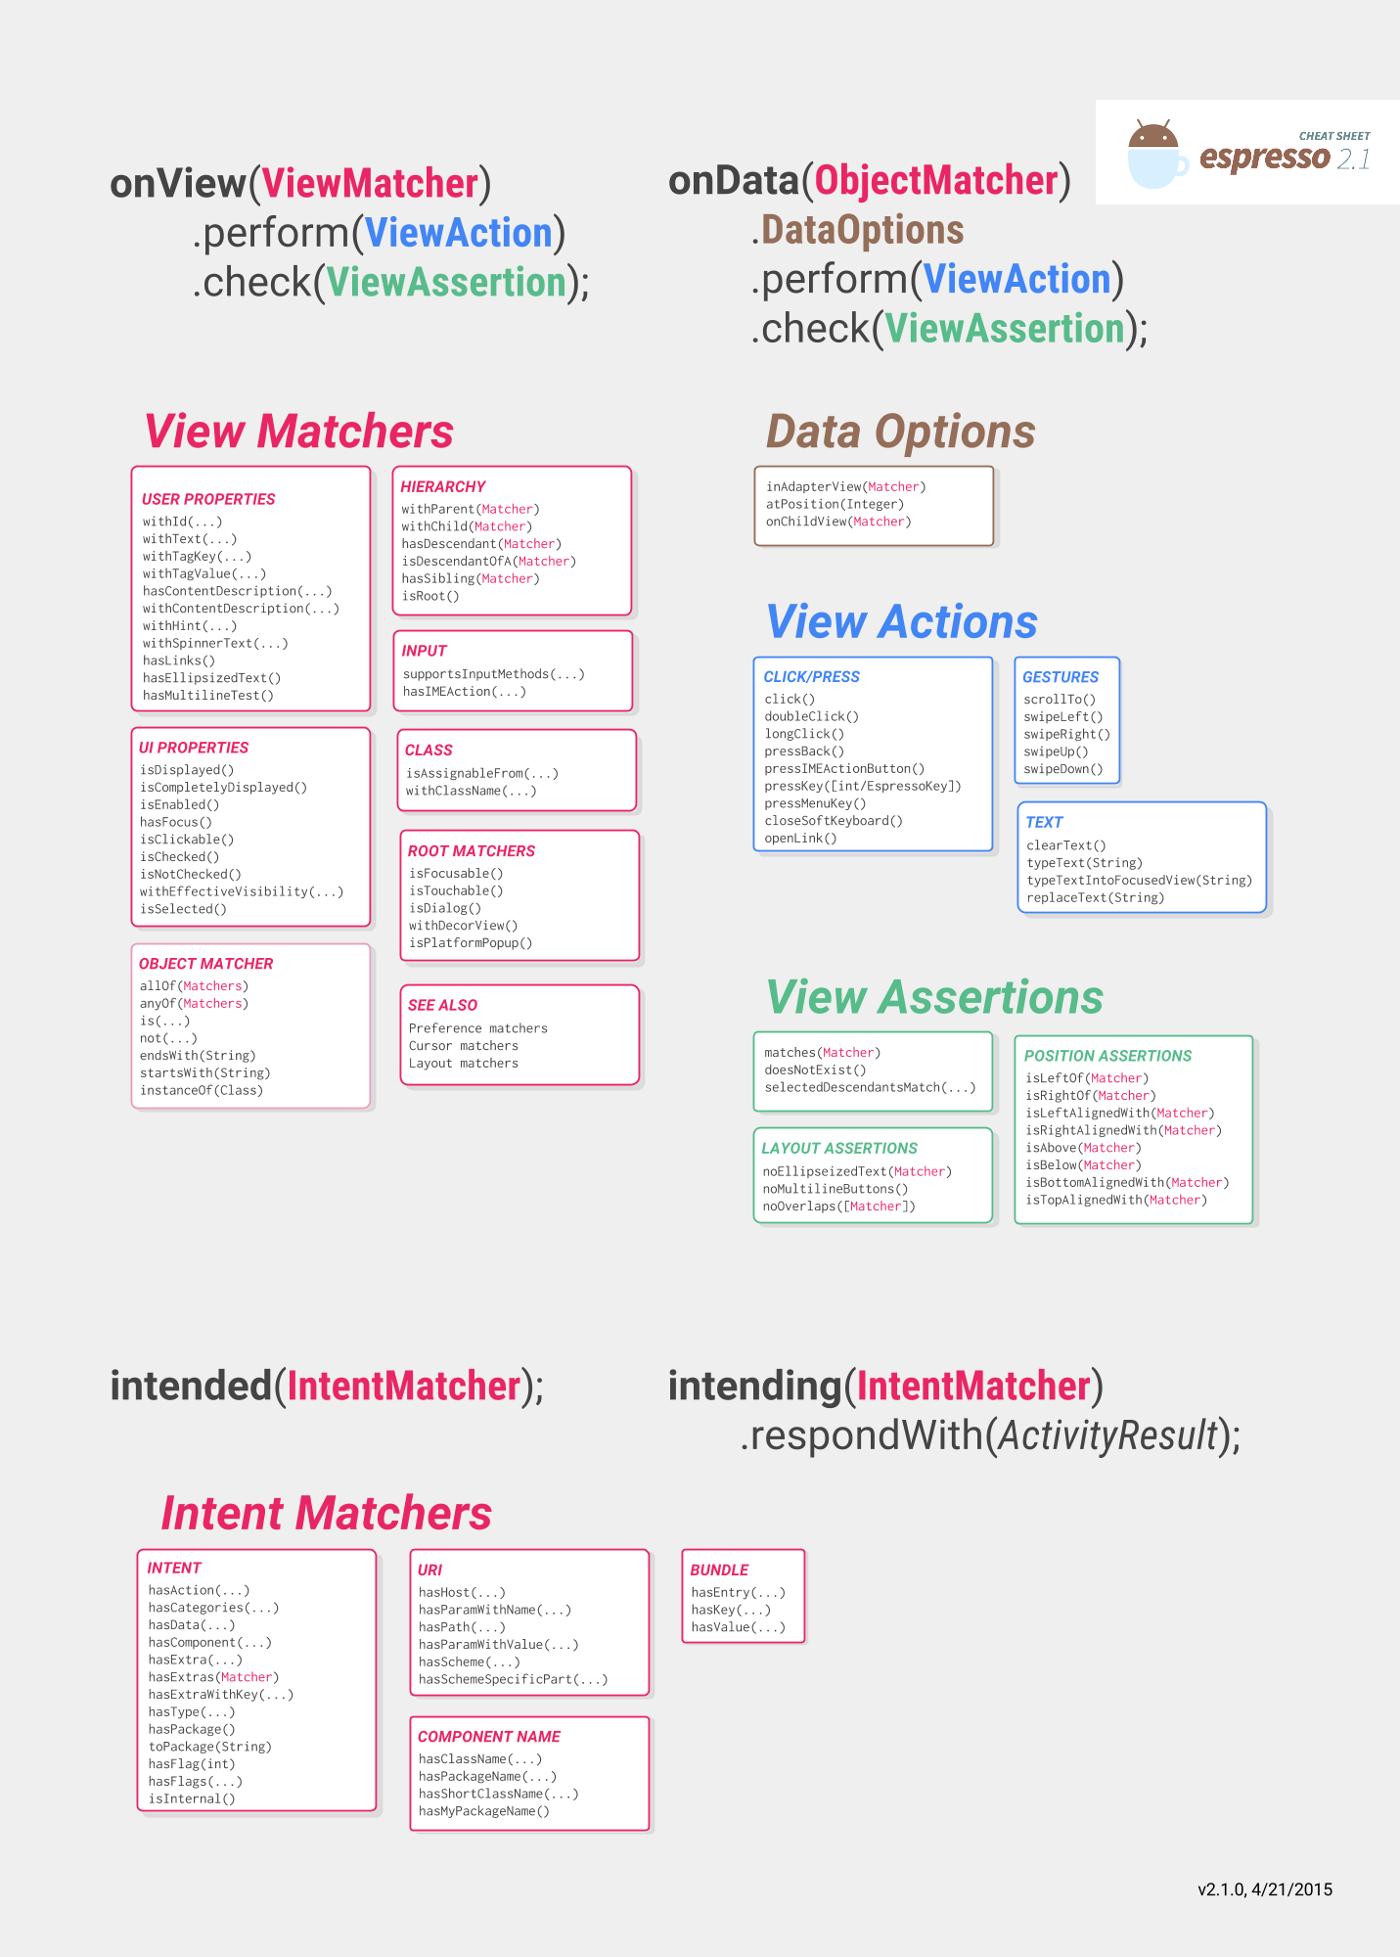 Lista de métodos disponibles para onView(), onData(), intended() e intending()